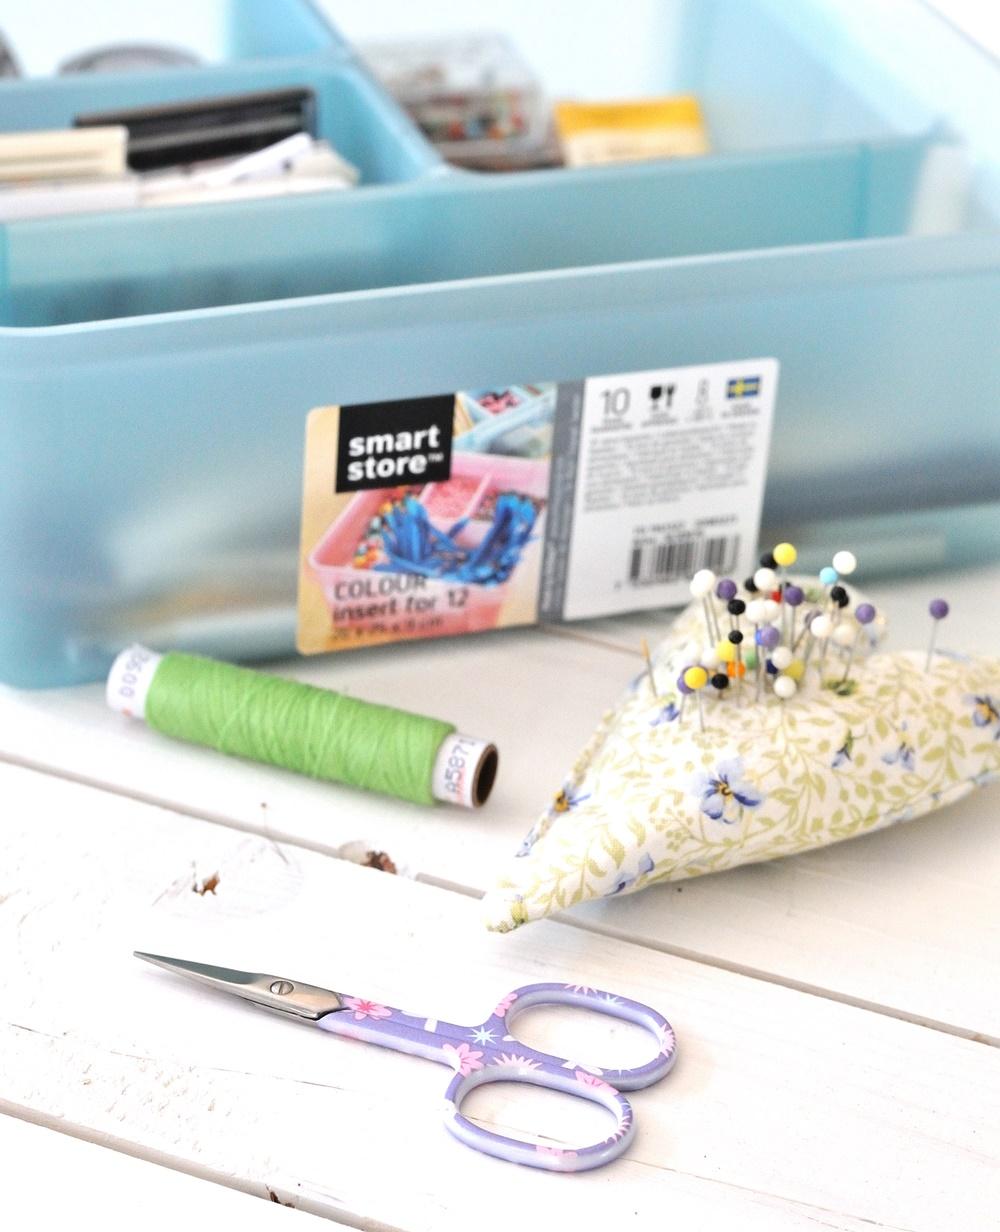 SmartStore Box mit Naehutensilien